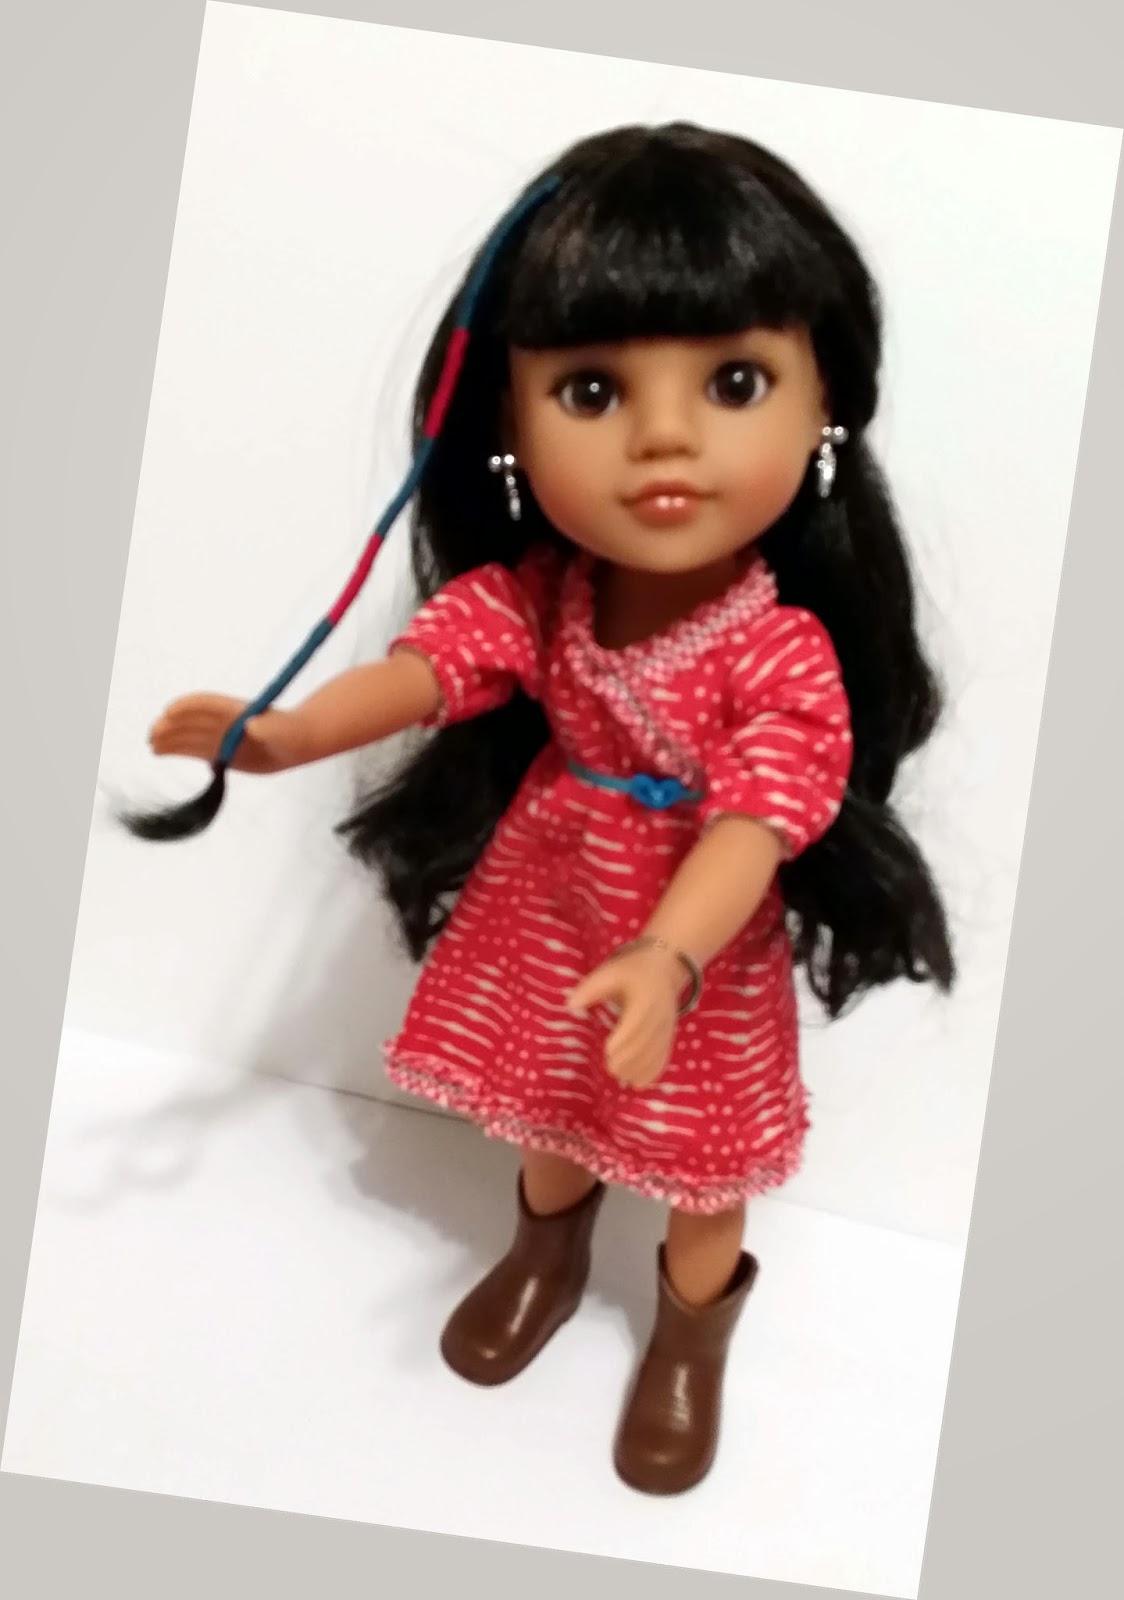 Mosi with hair twist, heart4heart doll